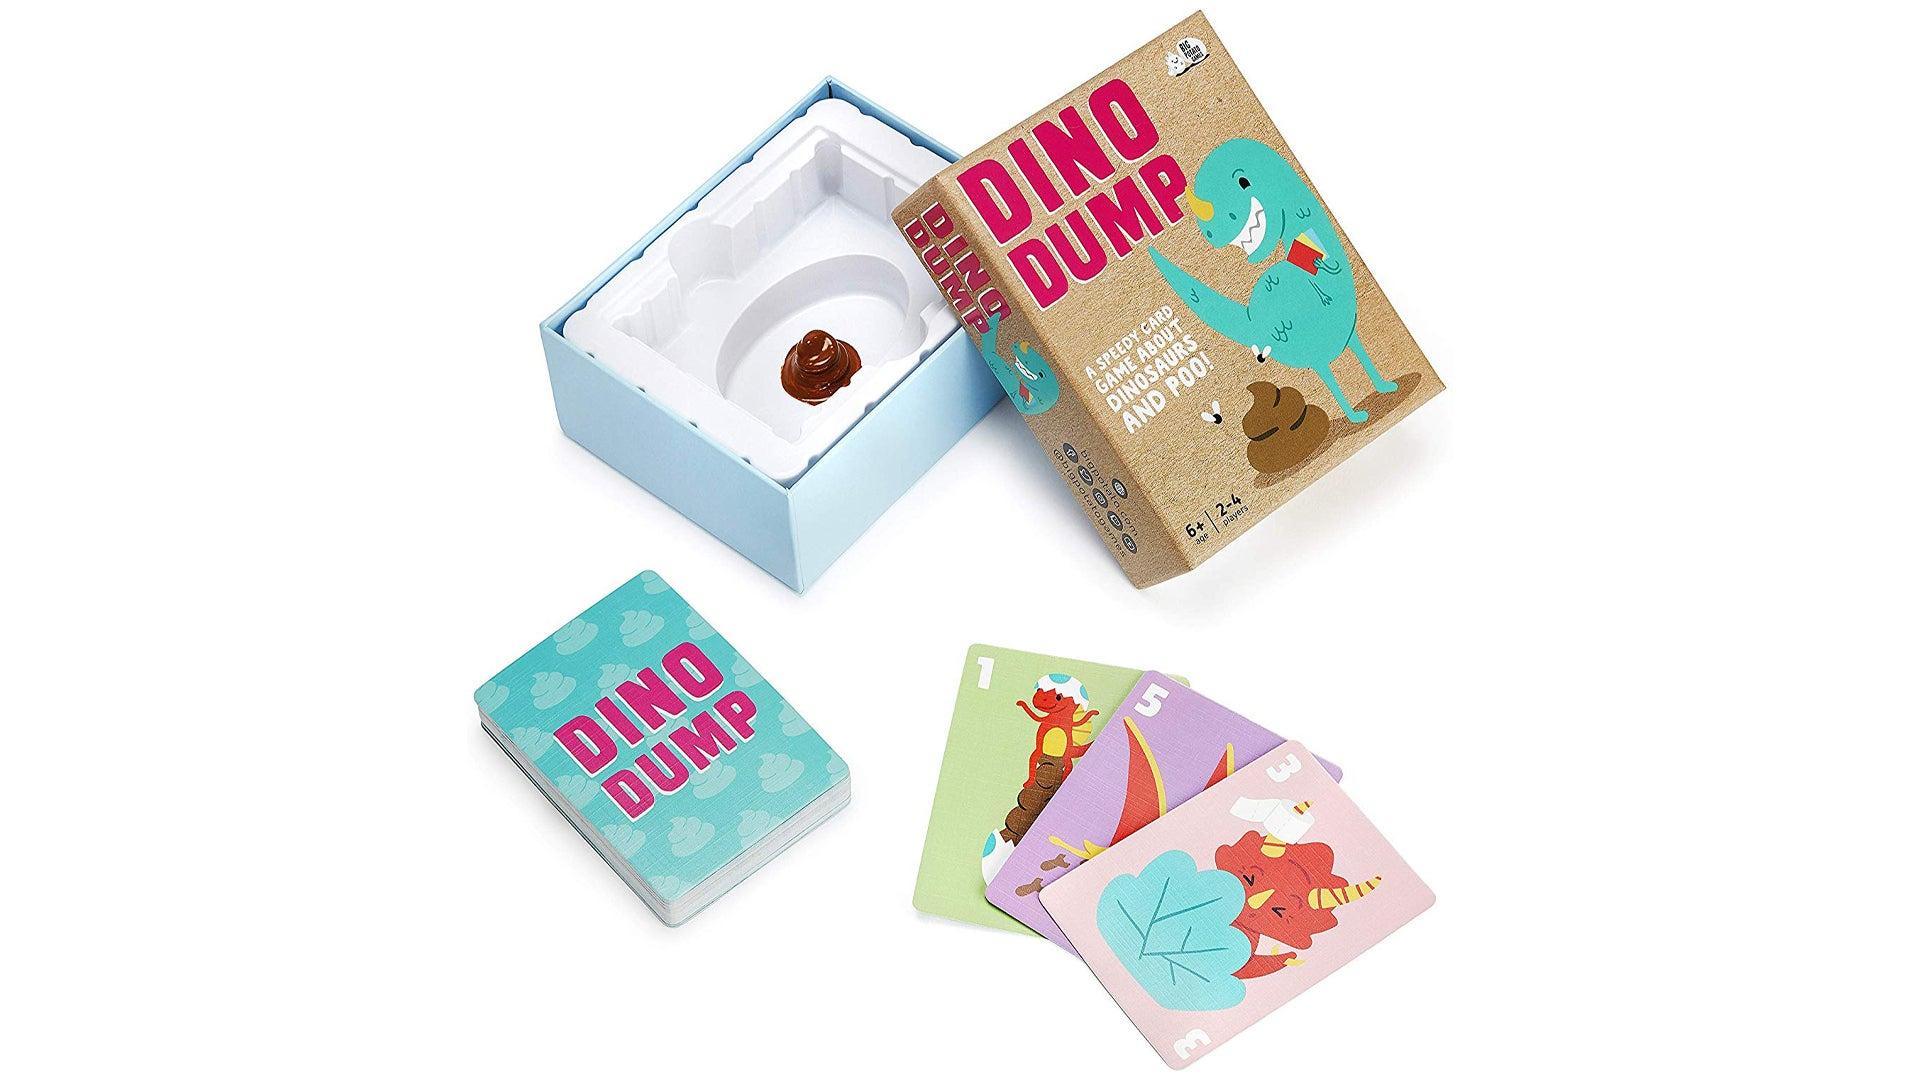 dino-dump-card-game-box-components.jpg